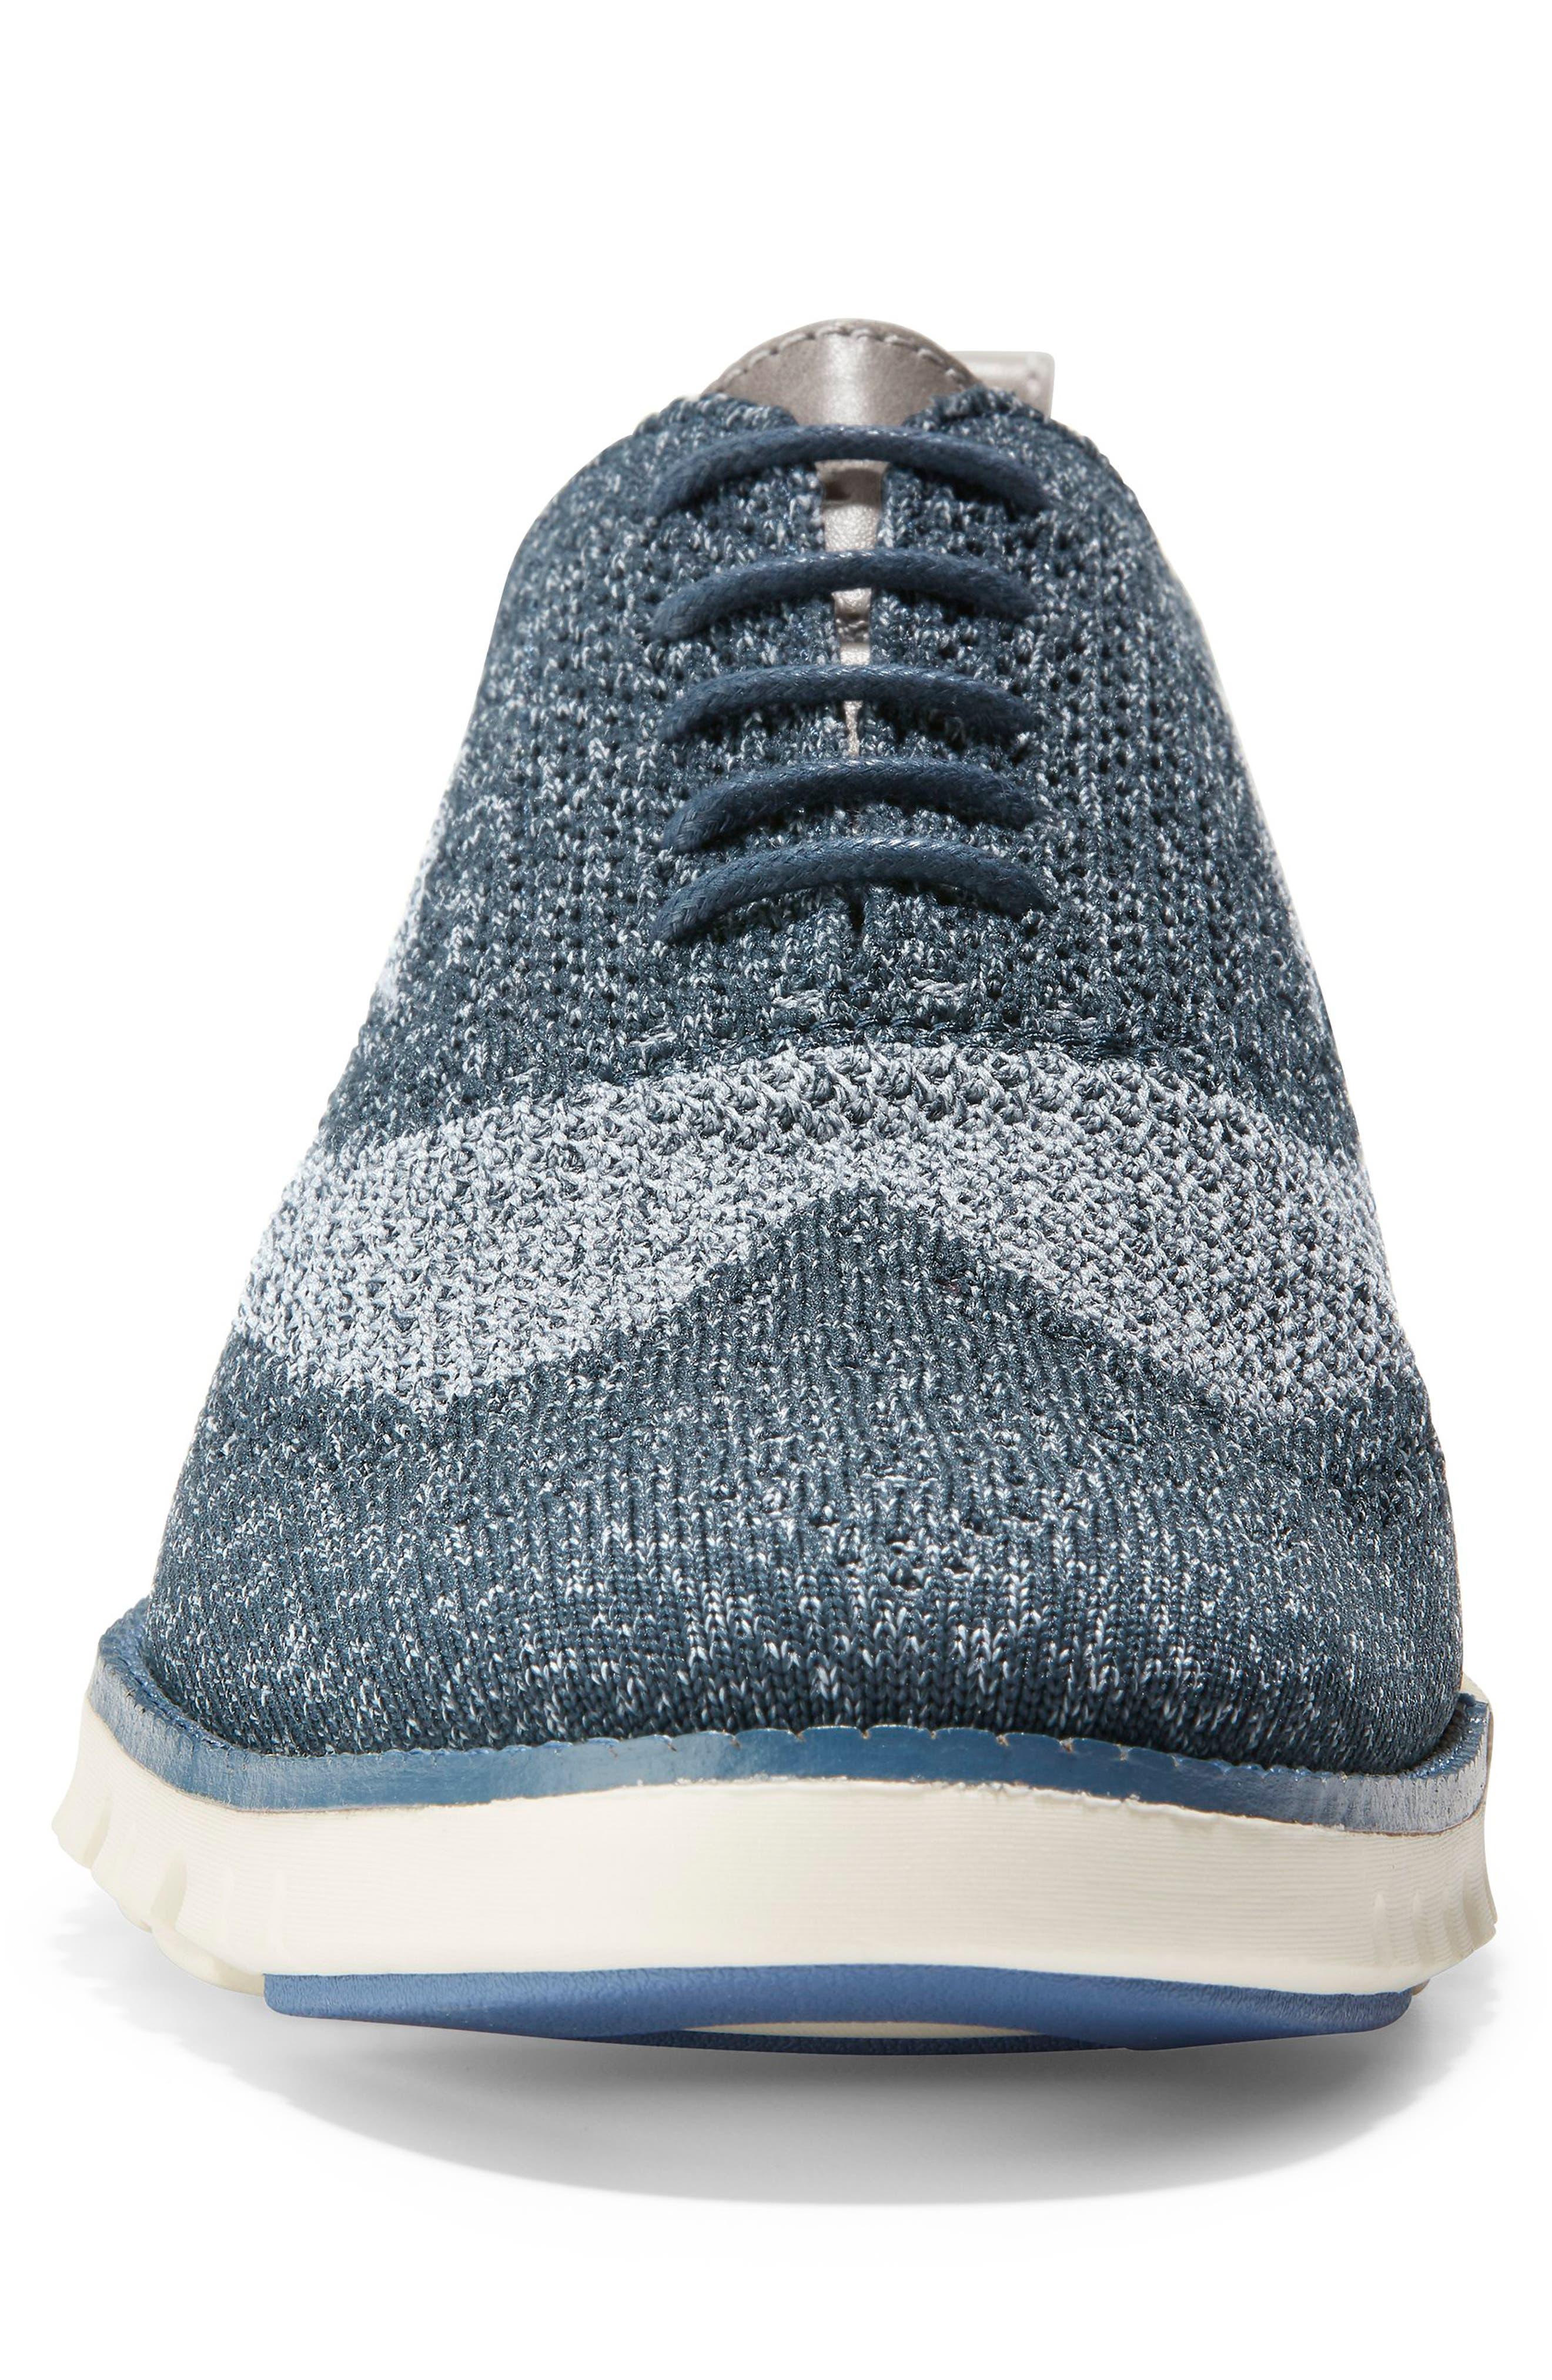 ZeroGrand Stitchlite Woven Wool Wingtip,                             Alternate thumbnail 4, color,                             BLUEBERRY KNIT